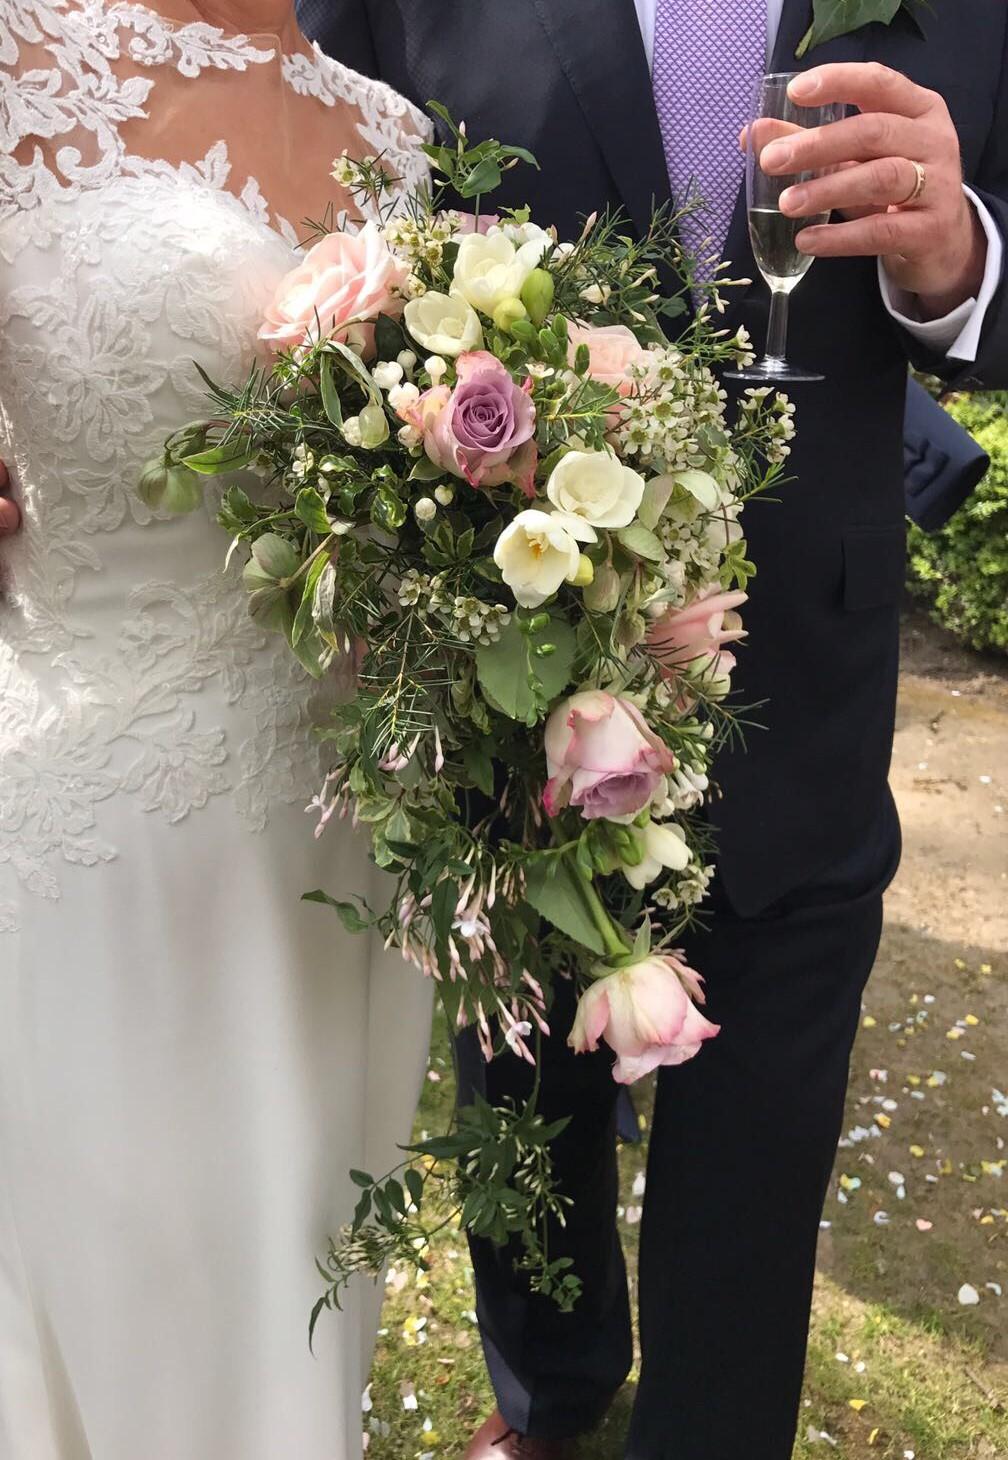 Wedding boquet arrangement Bucks